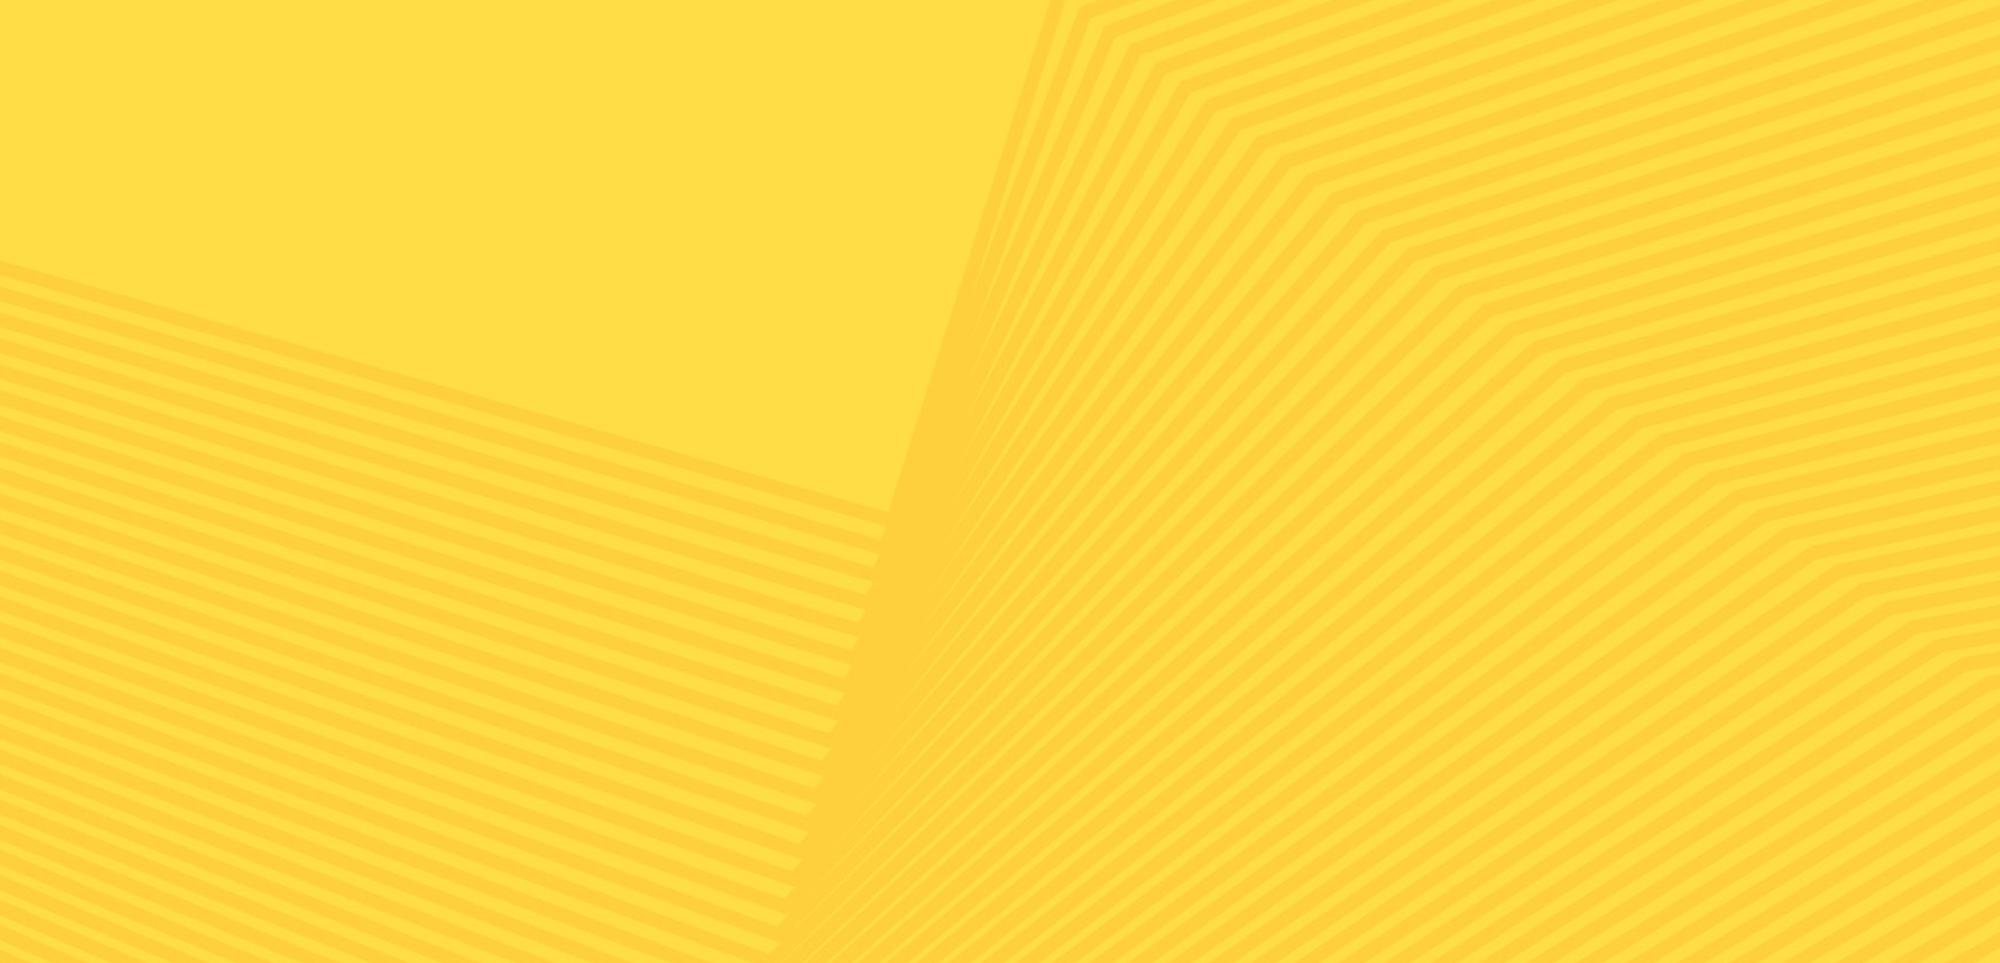 digital-wave-yellow-cta